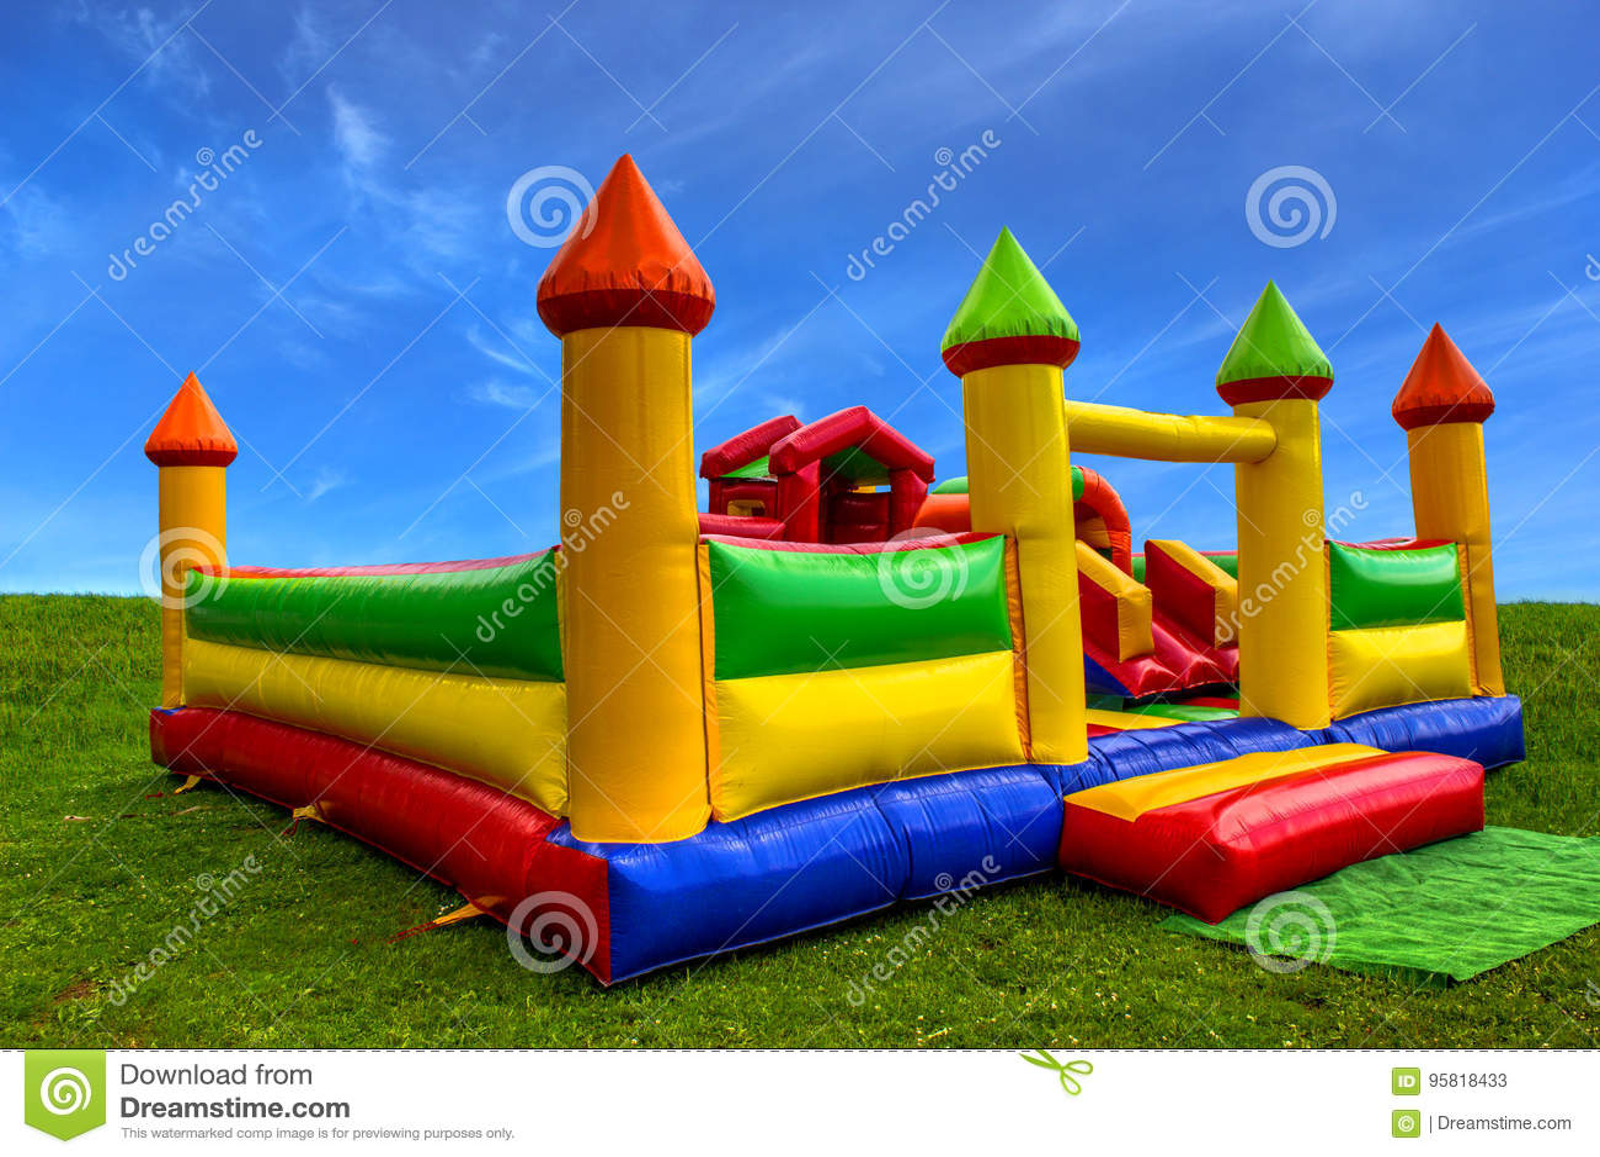 bb8eaa1022d Ζωηρόχρωμο διογκώσιμο κάστρο για παιδιά Στοκ Εικόνα - εικόνα από ...